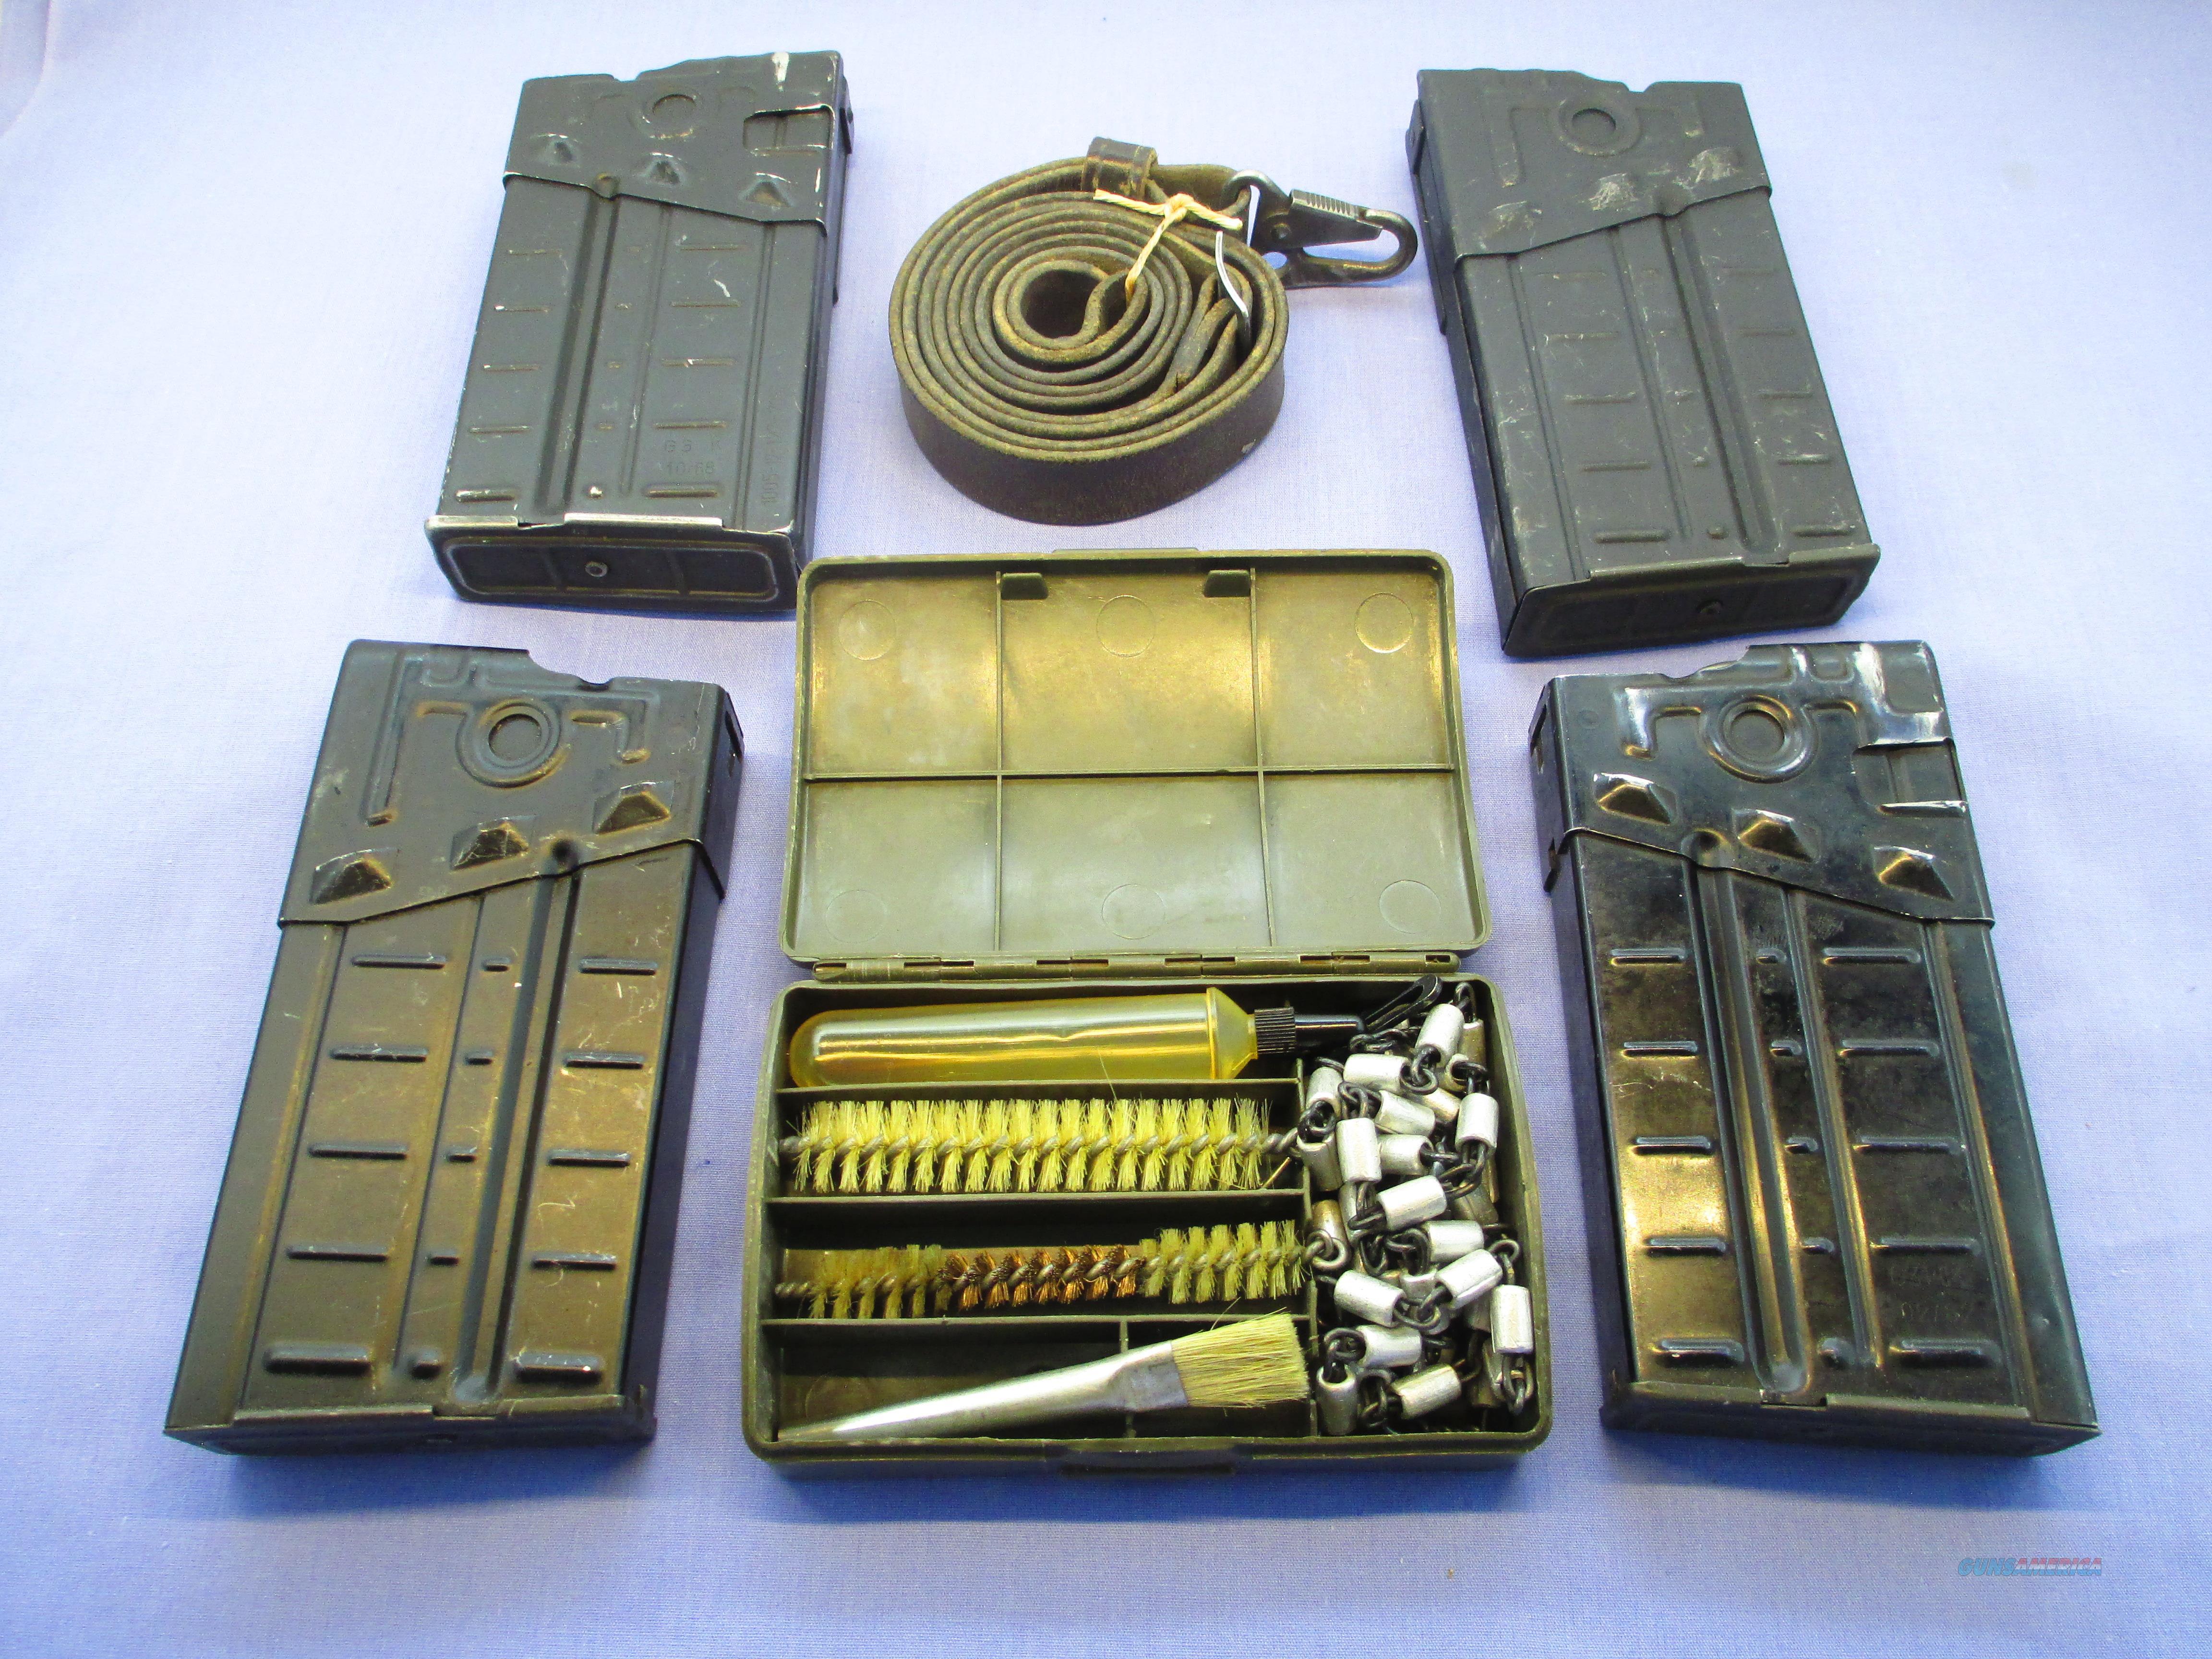 HK /G3/HK91 accessories SET  Non-Guns > Magazines & Clips > Rifle Magazines > HK/CETME